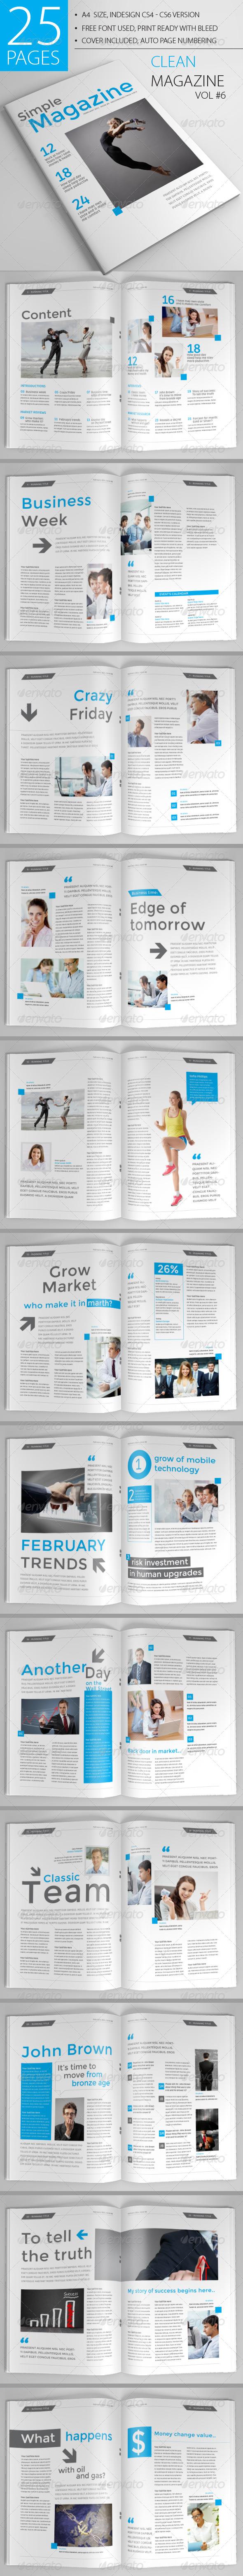 25 Pages Clean Magazine Vol6 - Magazines Print Templates